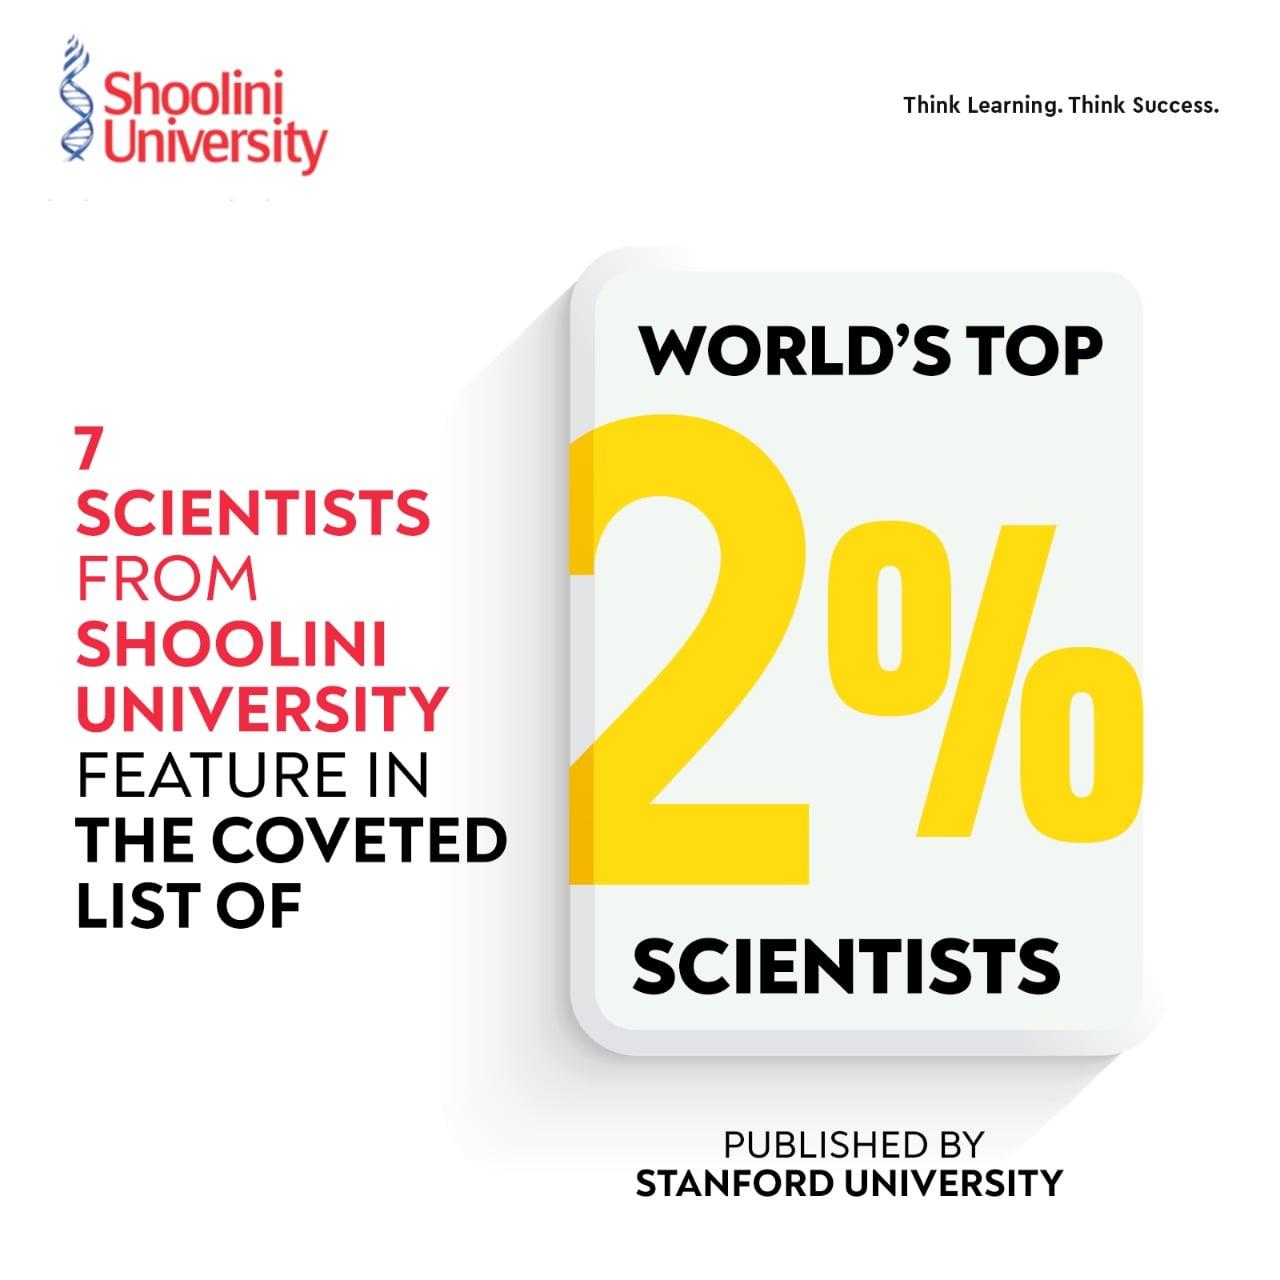 Scientists receive global acclaim